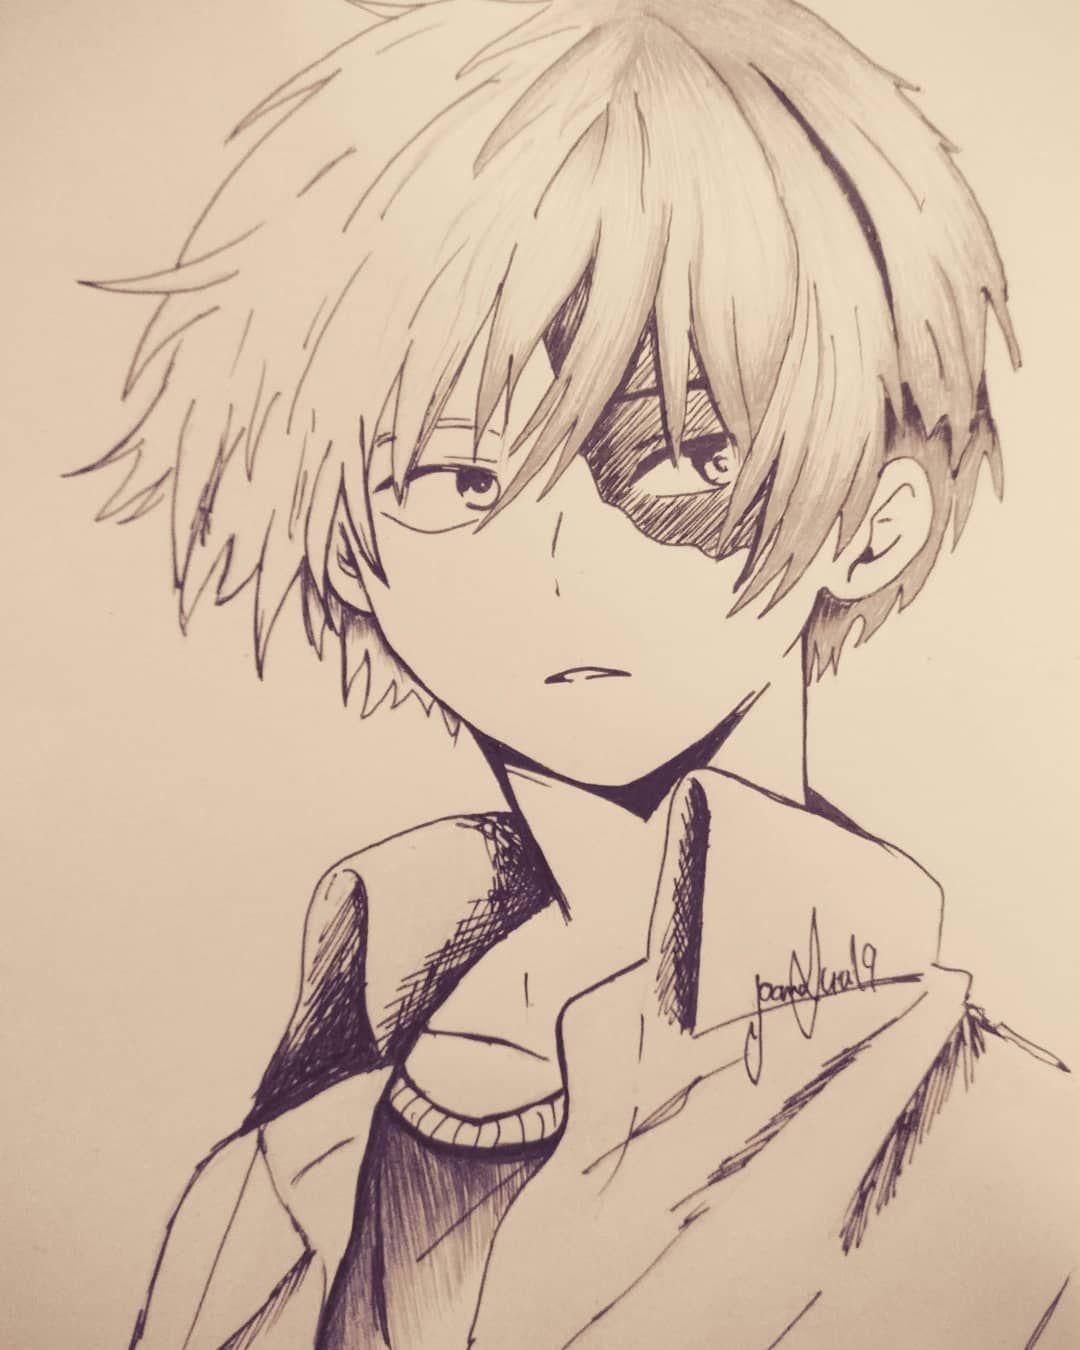 Todoroki Anime Bokunoheroacademia Myheroacademia Todoroki Art Izukumidoriya Heart Mha Todorok Anime Sketch Anime Drawings Sketches Anime Drawings